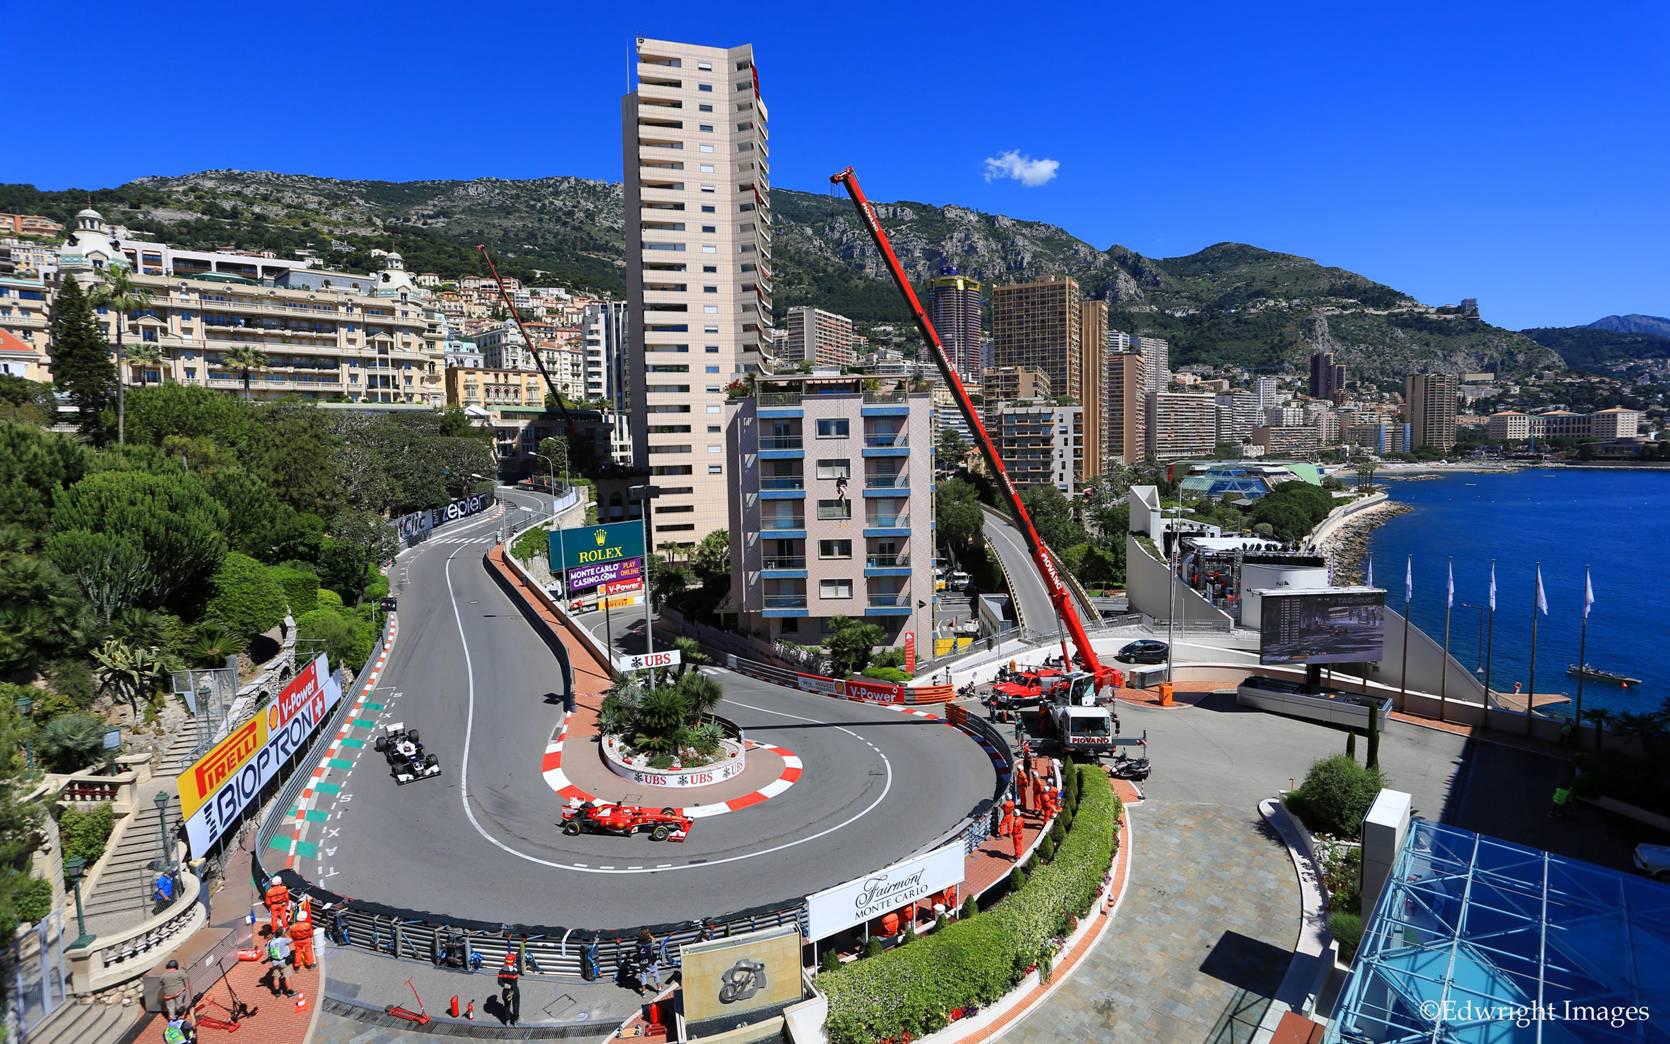 fairmont-hotel-monte-carlo-lustforthesublime